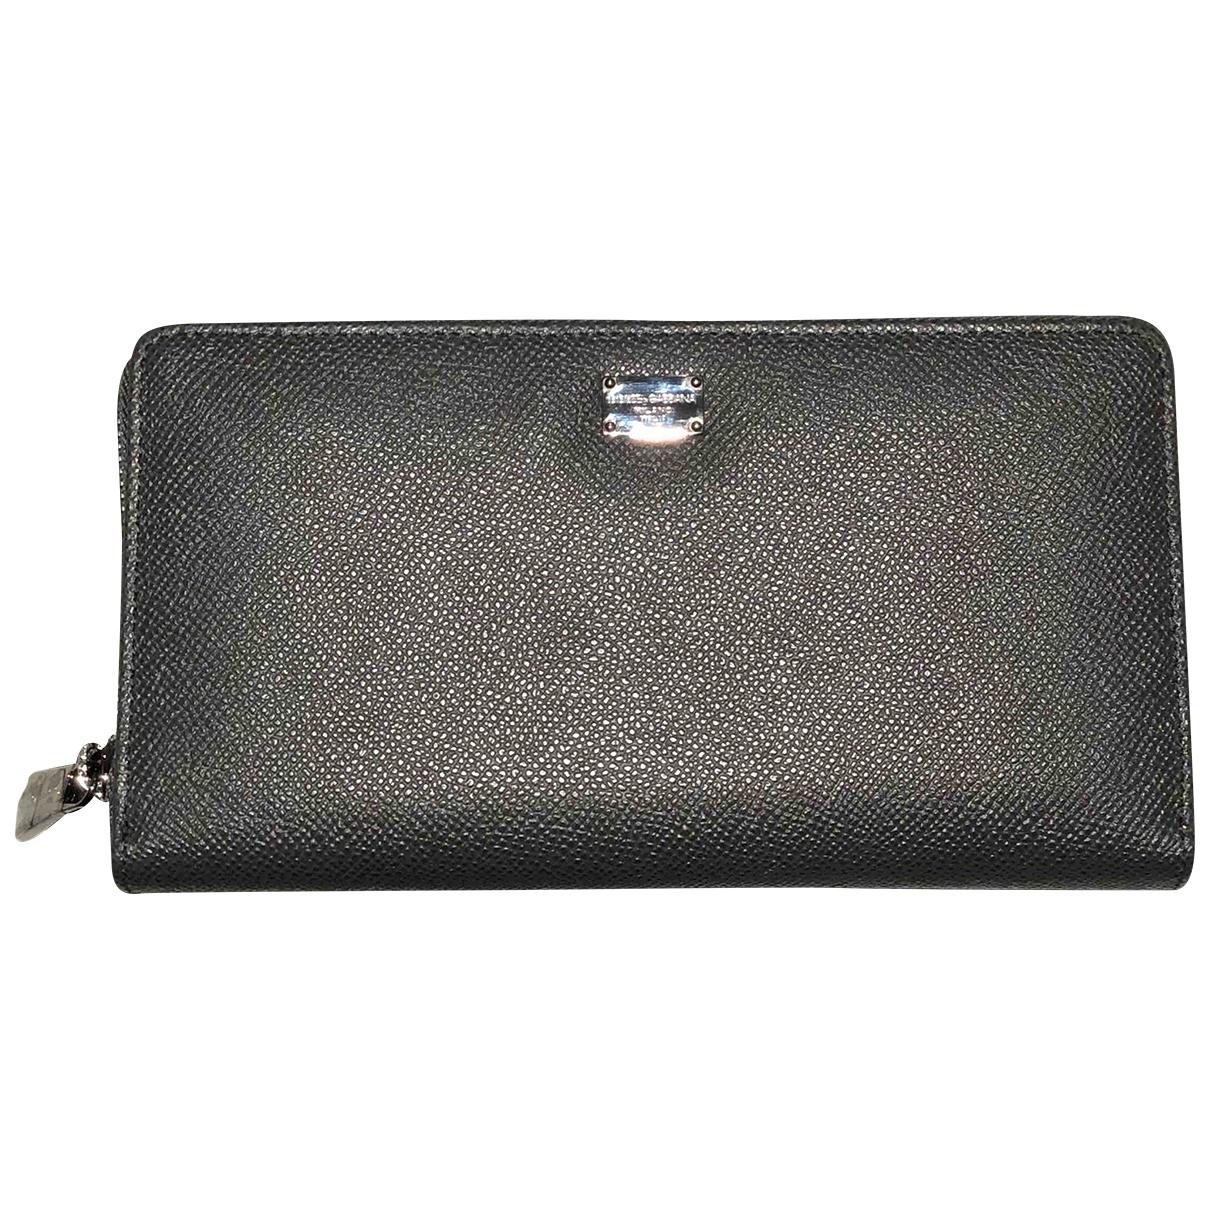 Dolce & Gabbana \N Portemonnaie in  Grau Leder